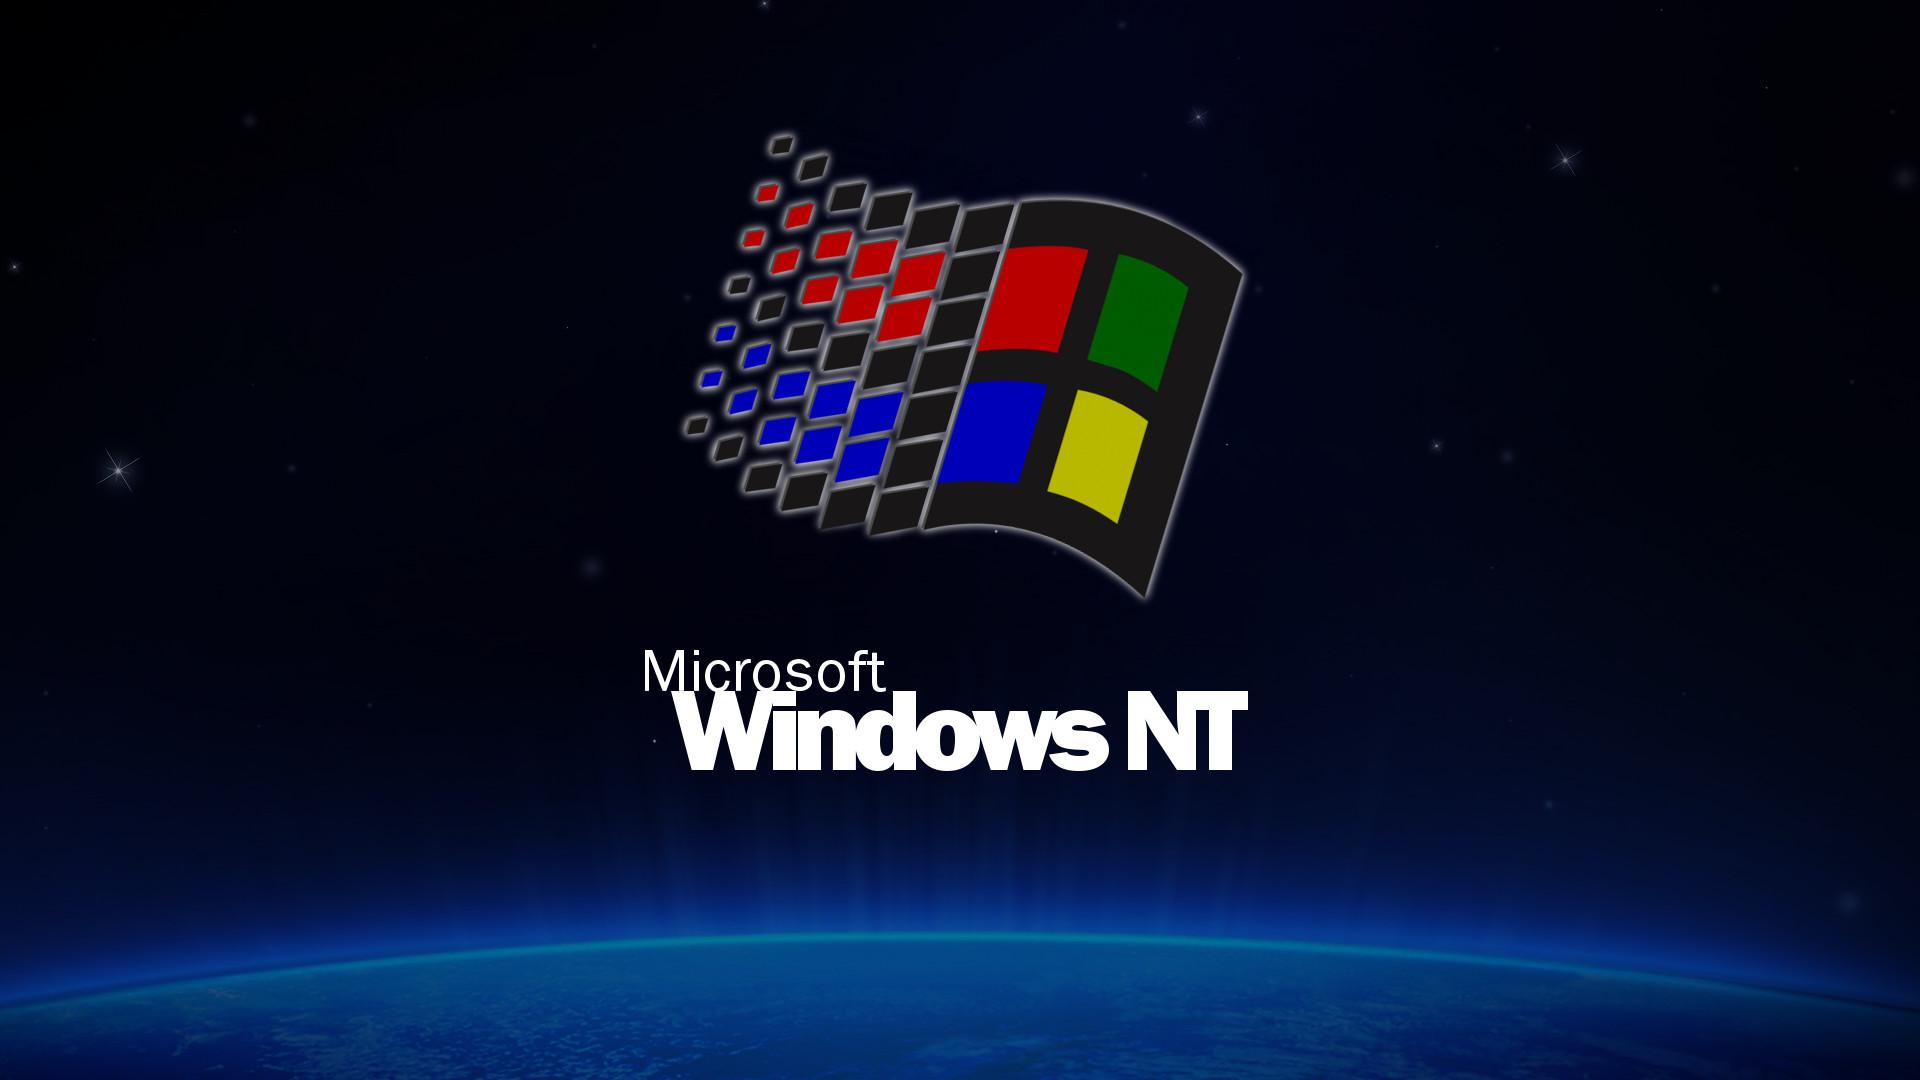 X Windows Nt   Wallpaper